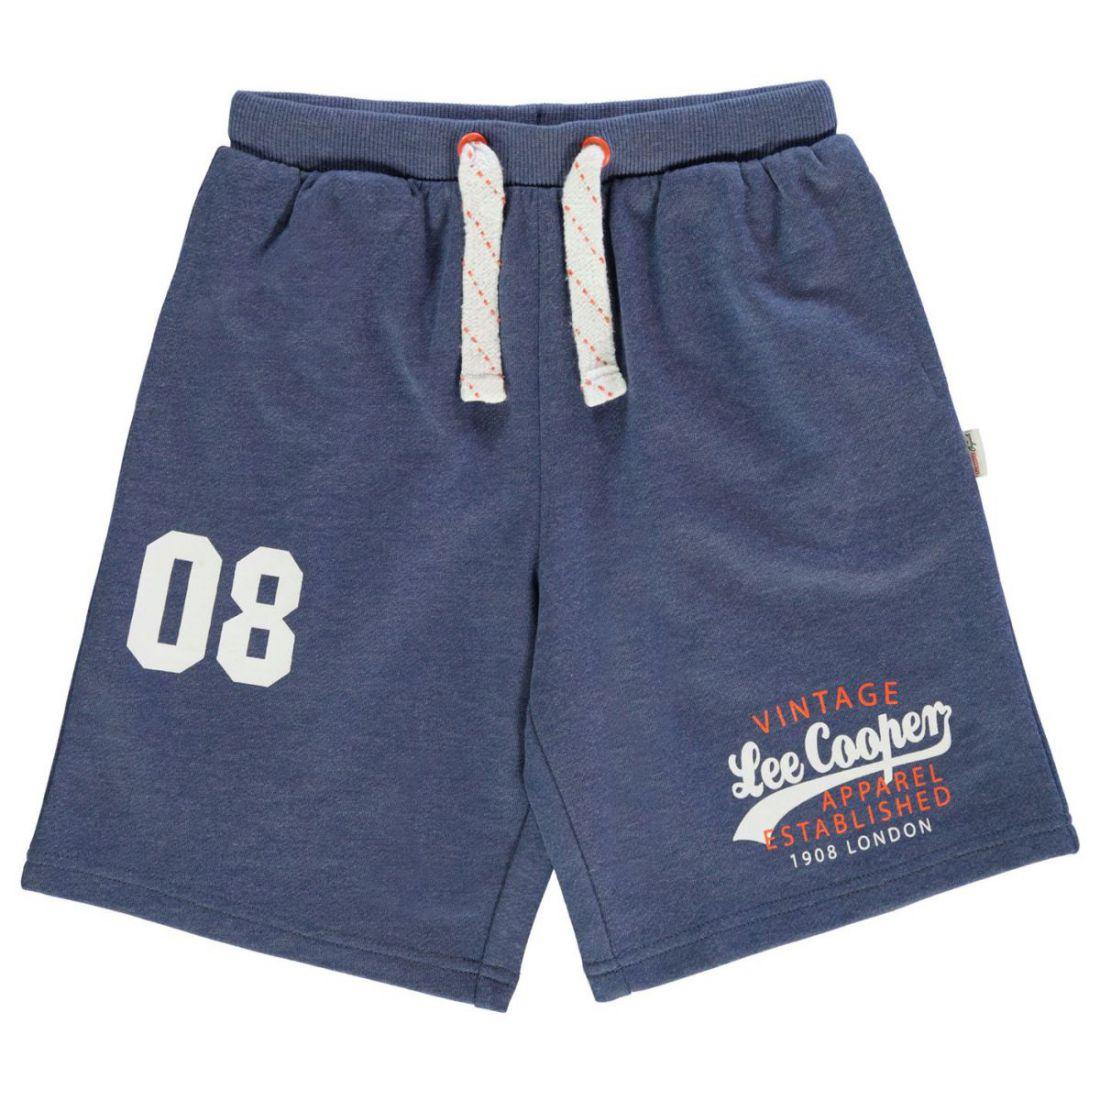 4666eb684581 Details about Lee Cooper Kids Boys Fleece Shorts Junior Pants Trousers  Bottoms Print Jersey